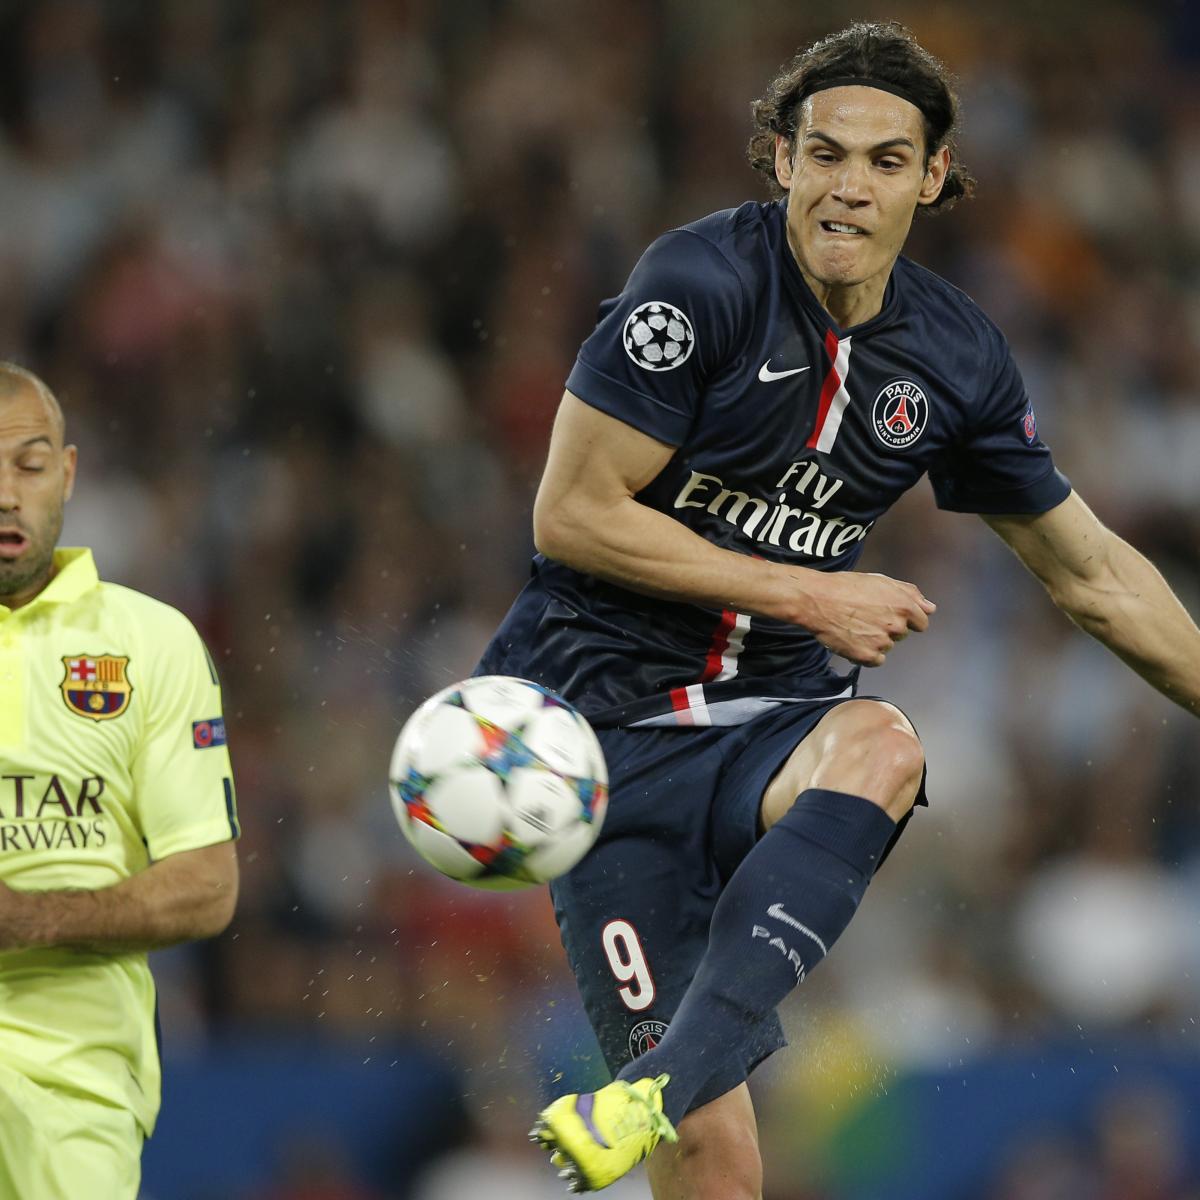 Manchester United Transfer News Latest Rumours On Lucas: Manchester United Transfer News: Latest Edinson Cavani